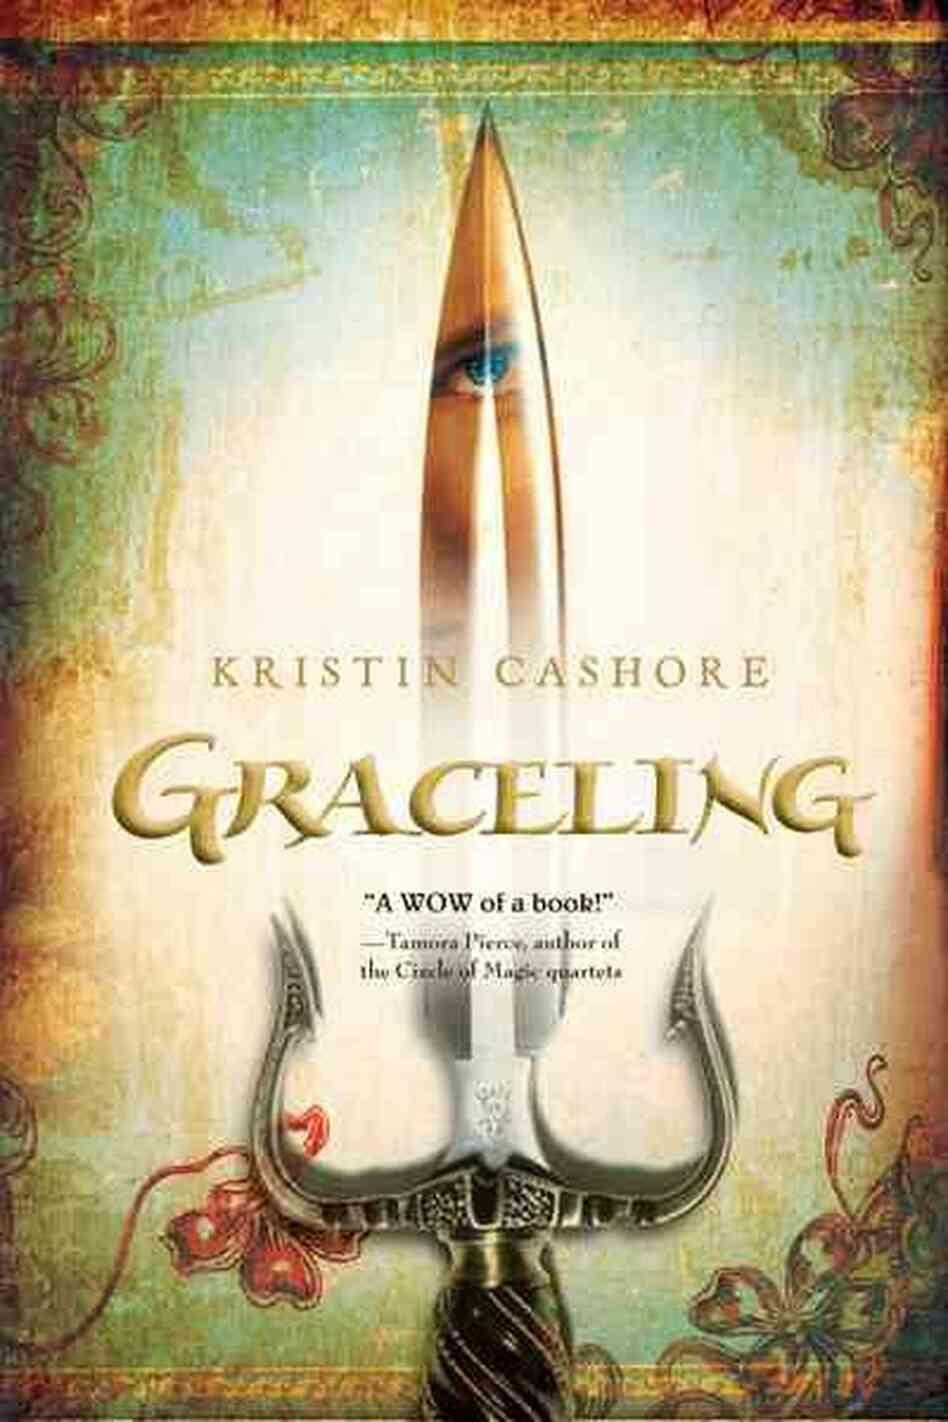 Novel study graceling by kristin cashore